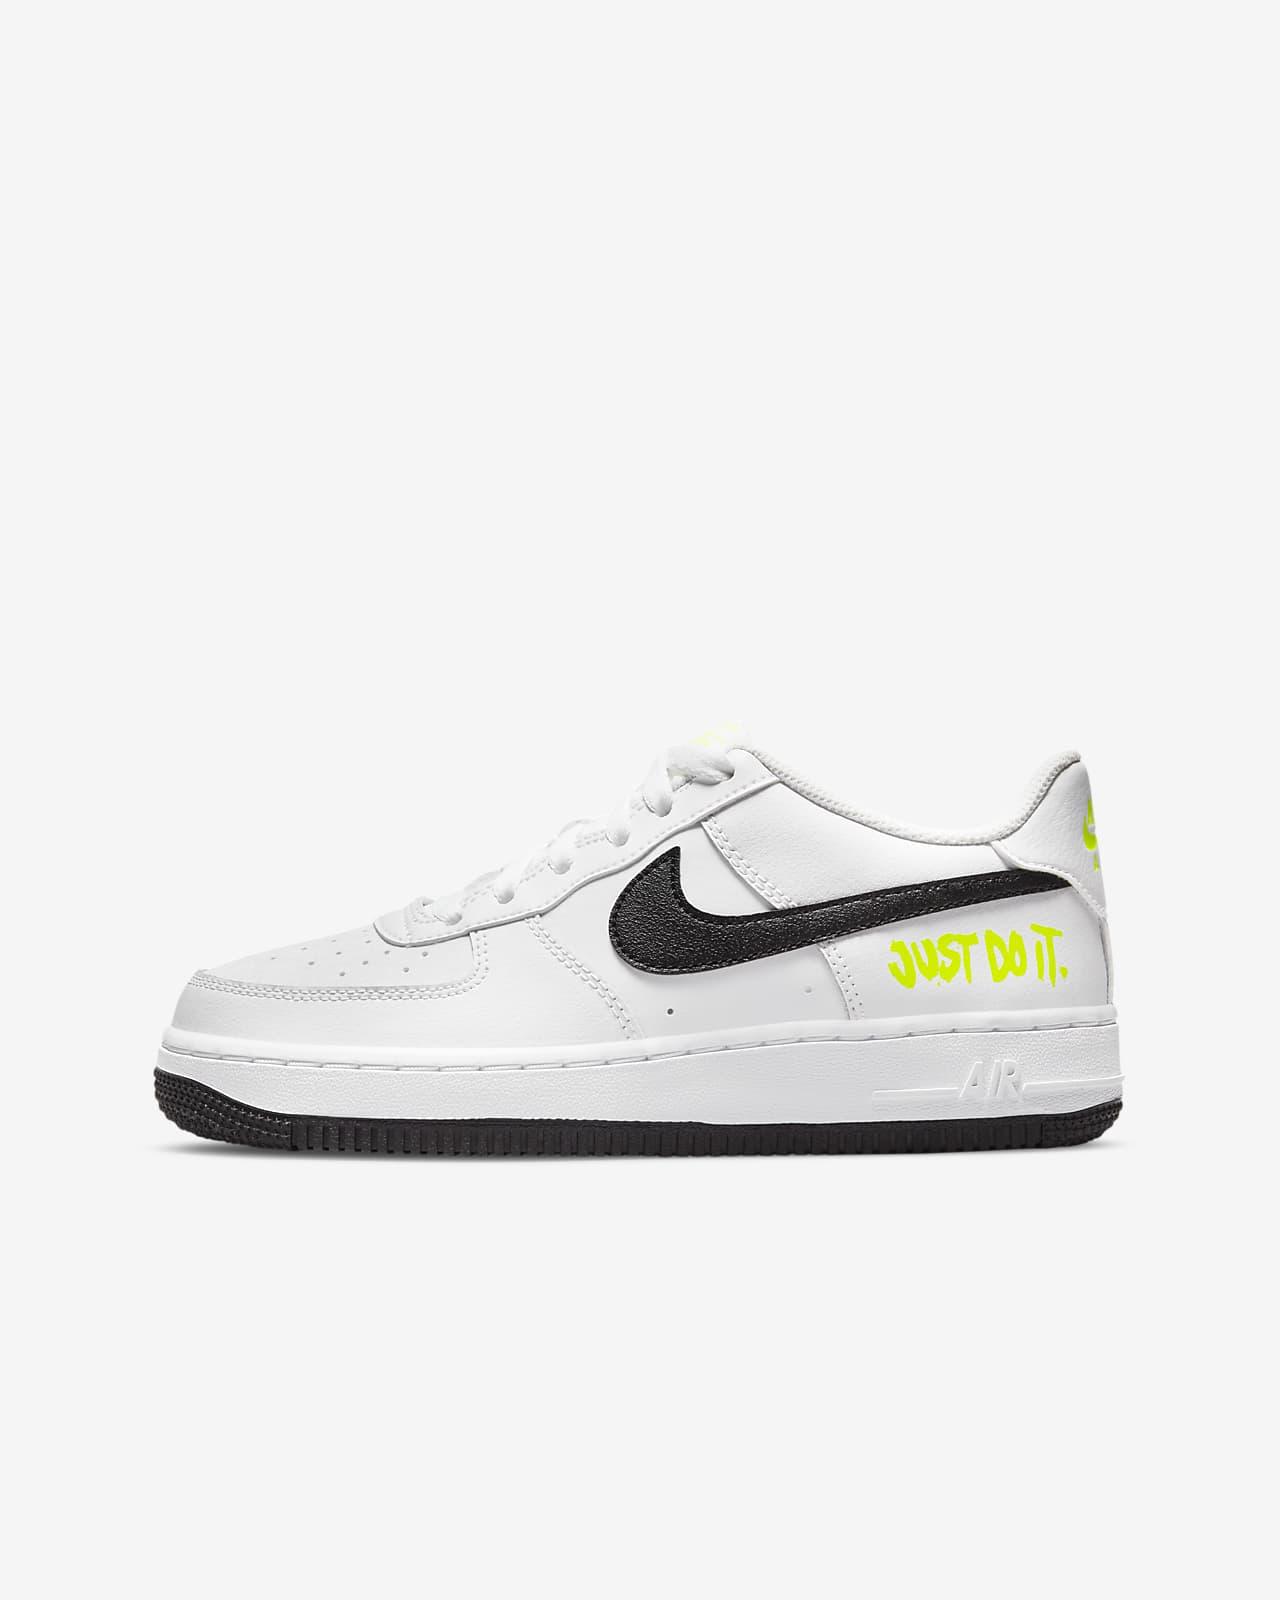 Nike Air Force 1 Low Big Kids' Shoes